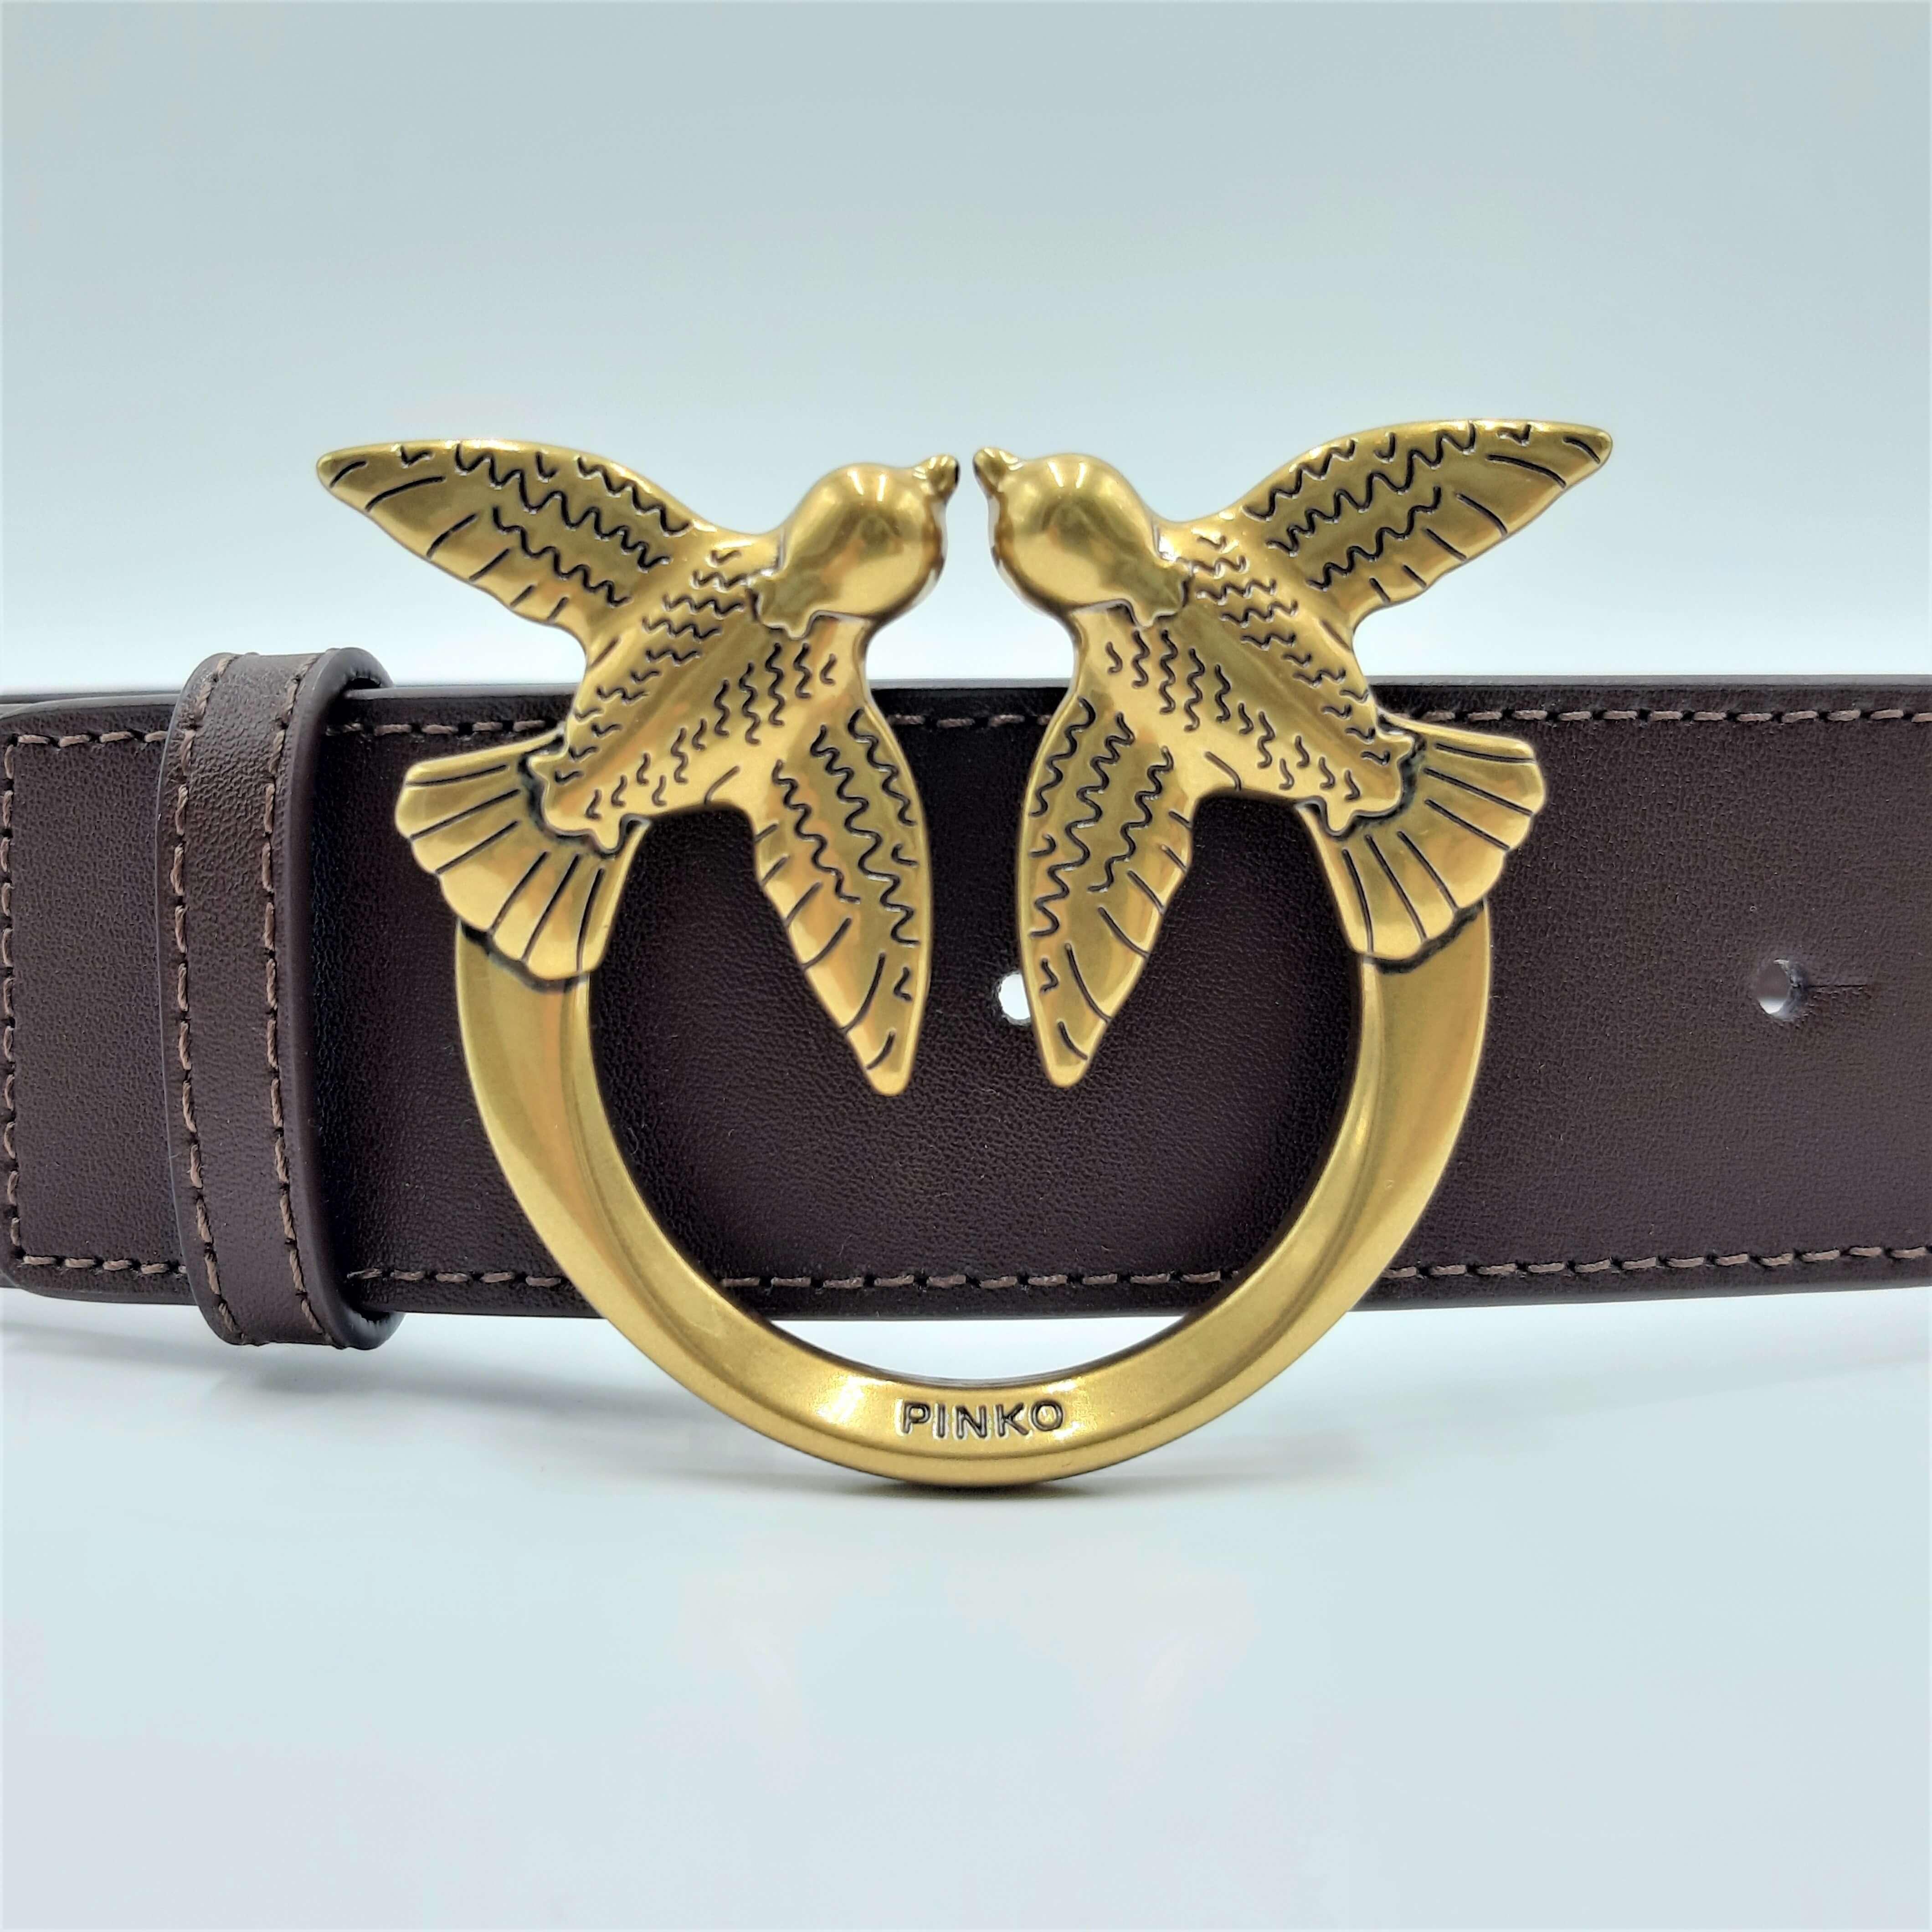 Cintura Love Berry Hips Simply Belt H4 marrone Pinko